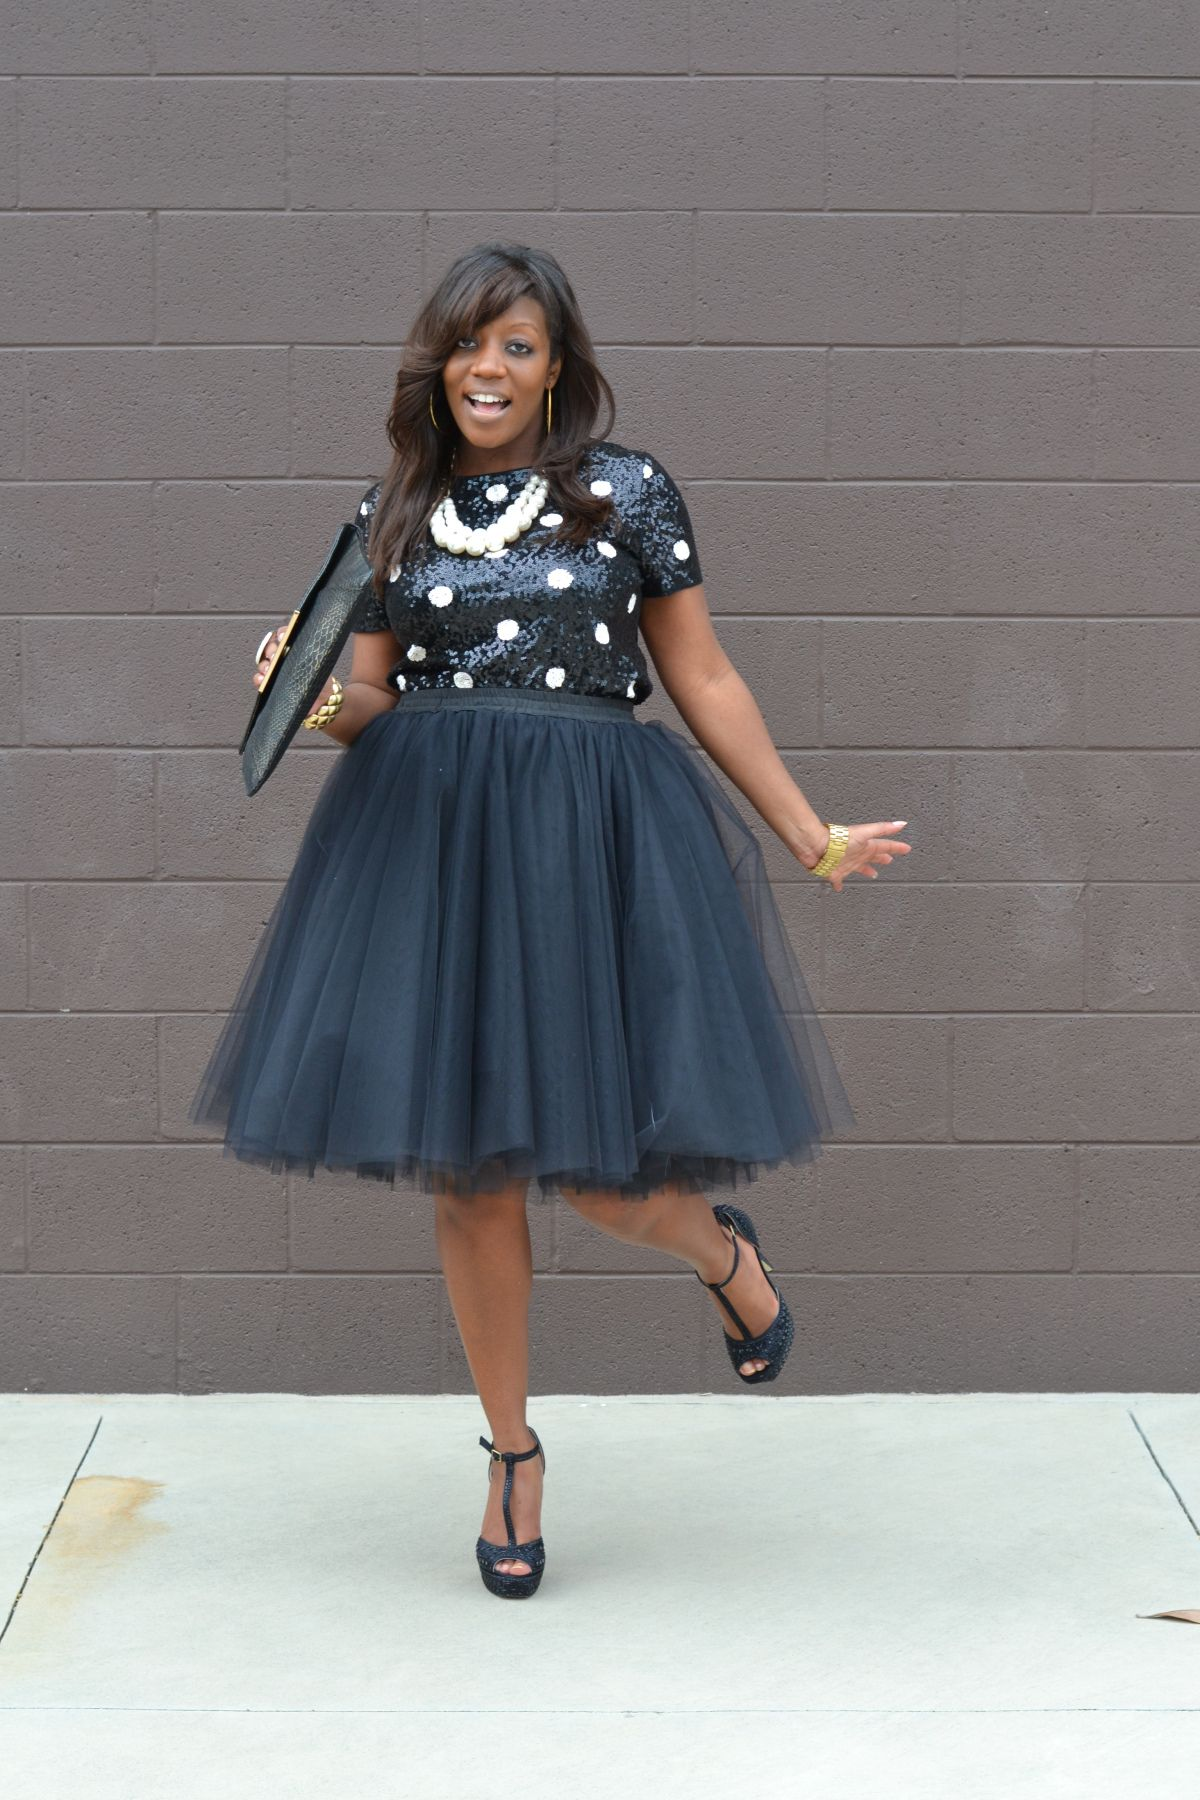 a4acff402 Kenya L Fashion Blog: Tulle Skirt - Holiday Party Style | Kenya L ...